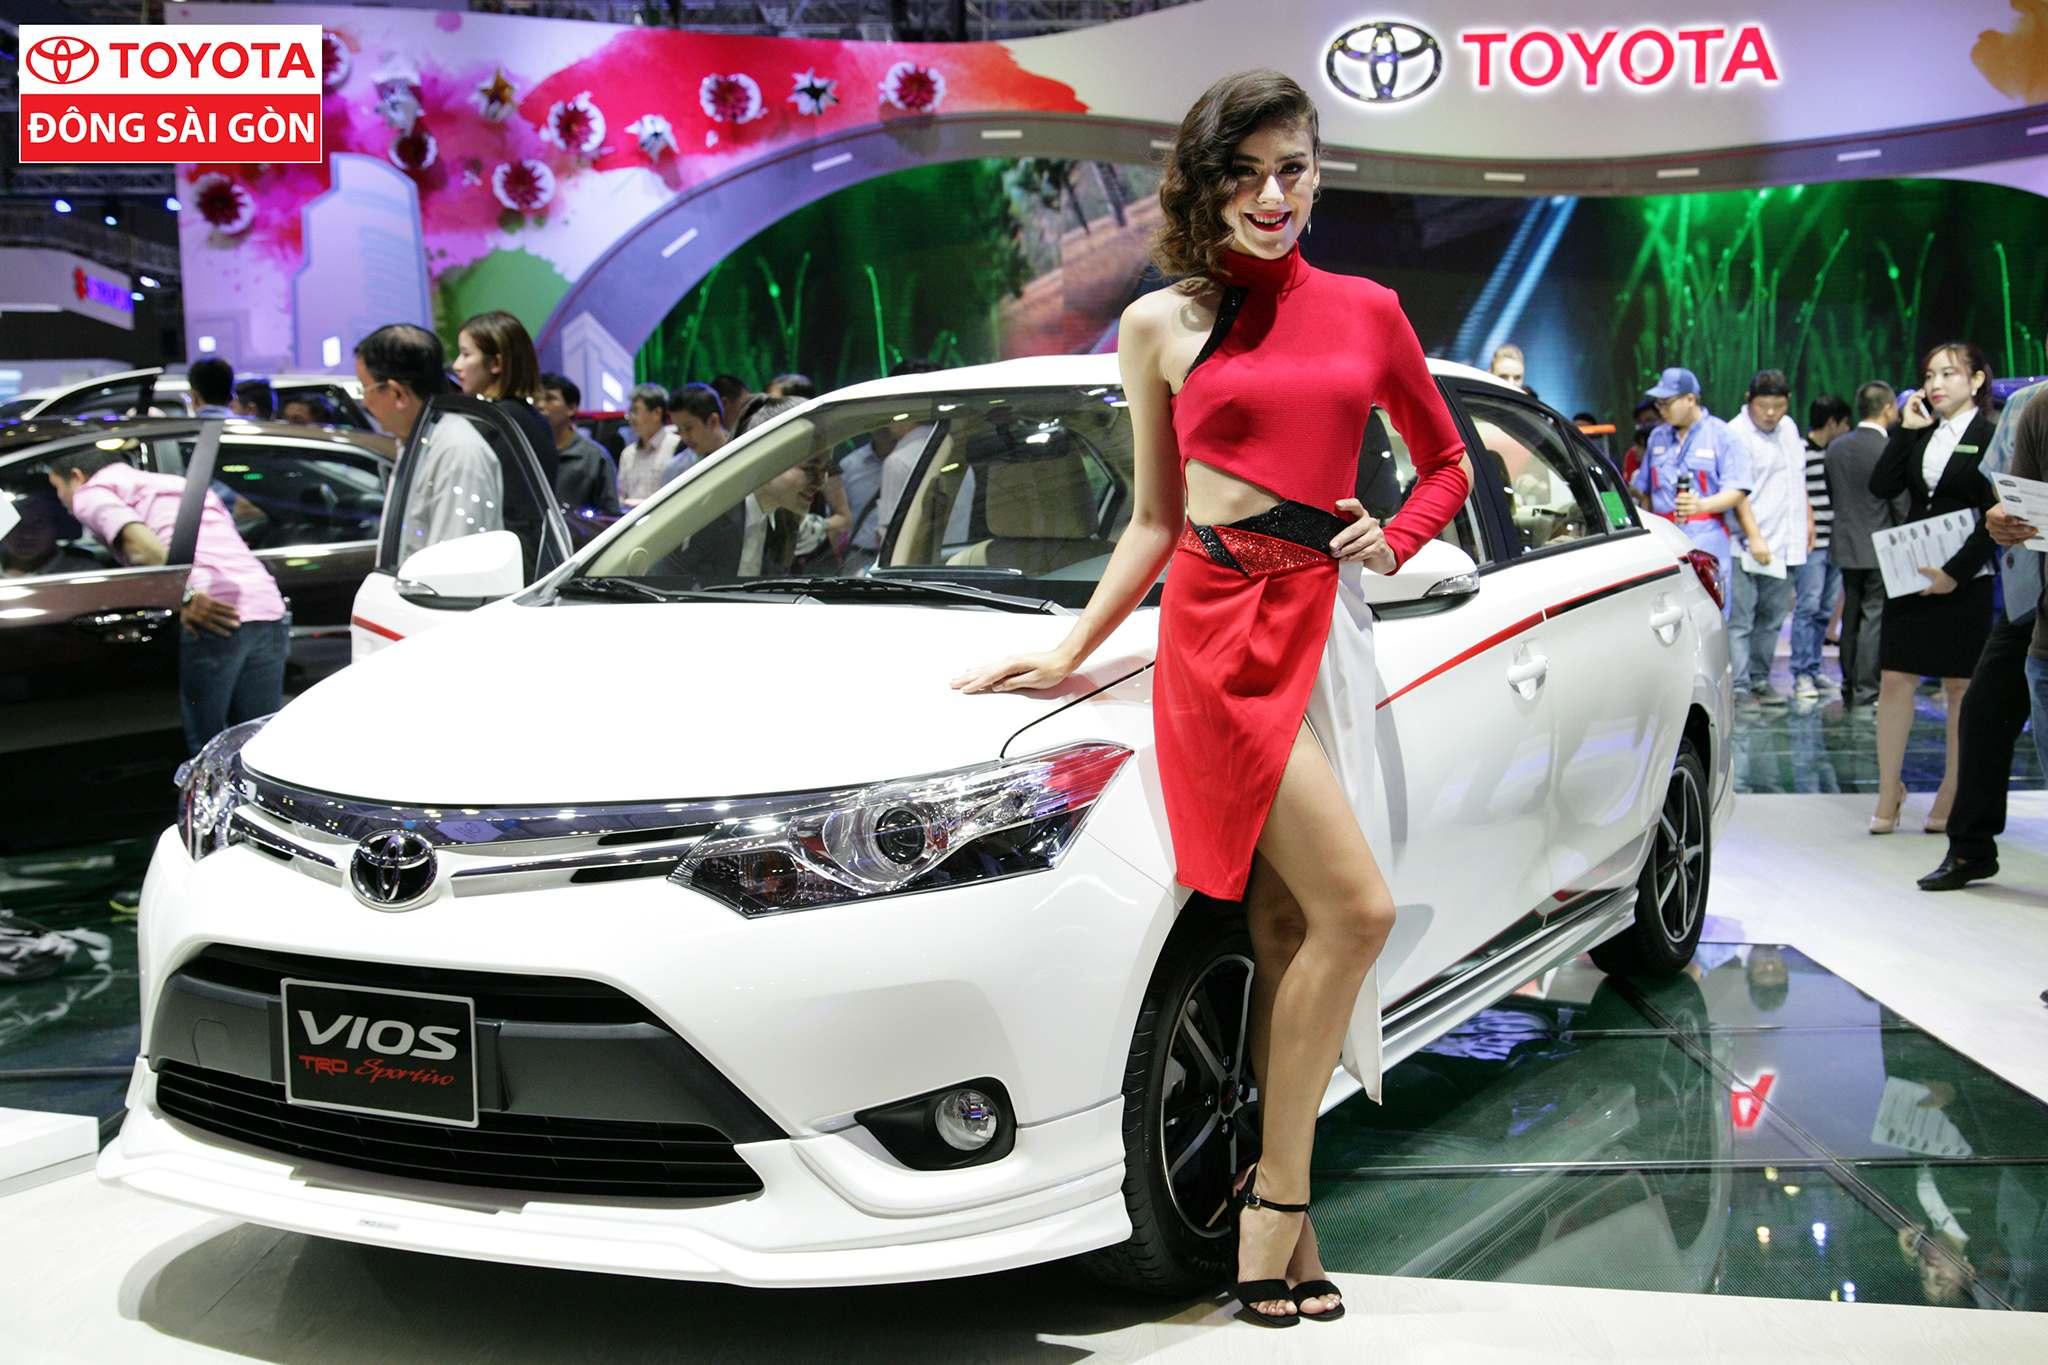 vietnam motor show 20177 Toyota at Vietnam Motor Show 2017